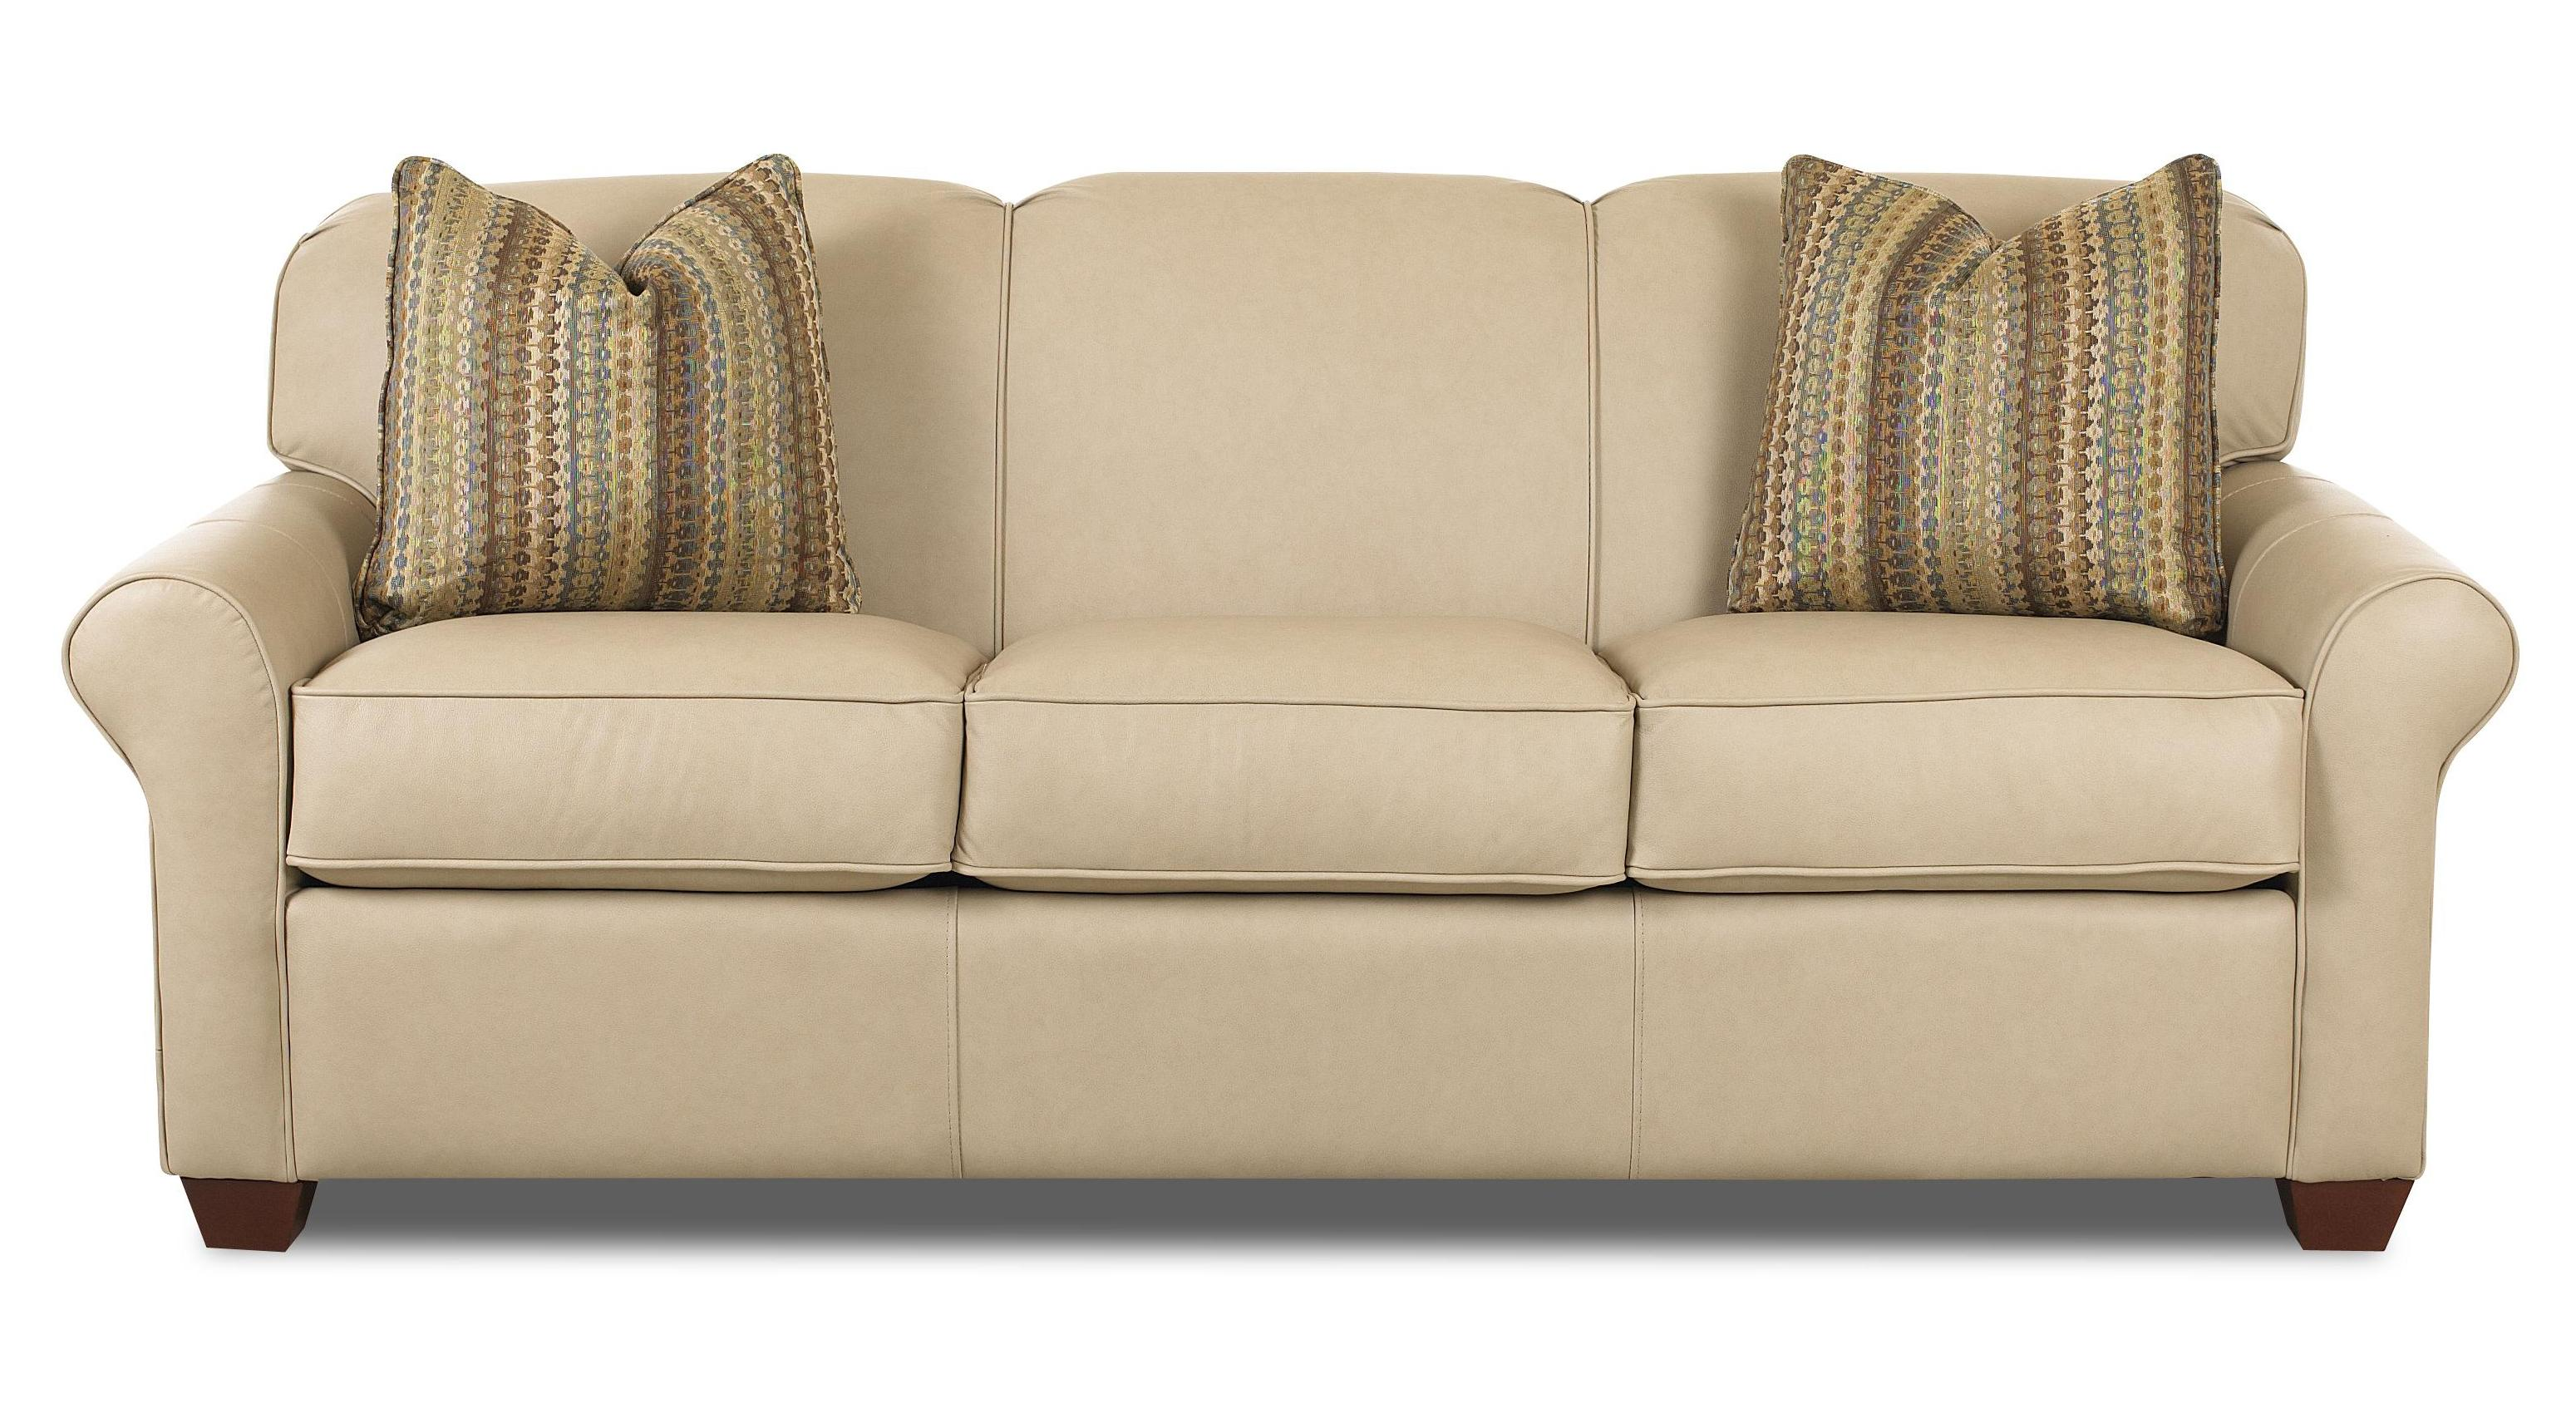 Klaussner sofa bed klaussner living room tilly k84200 s for Klaussner sofa